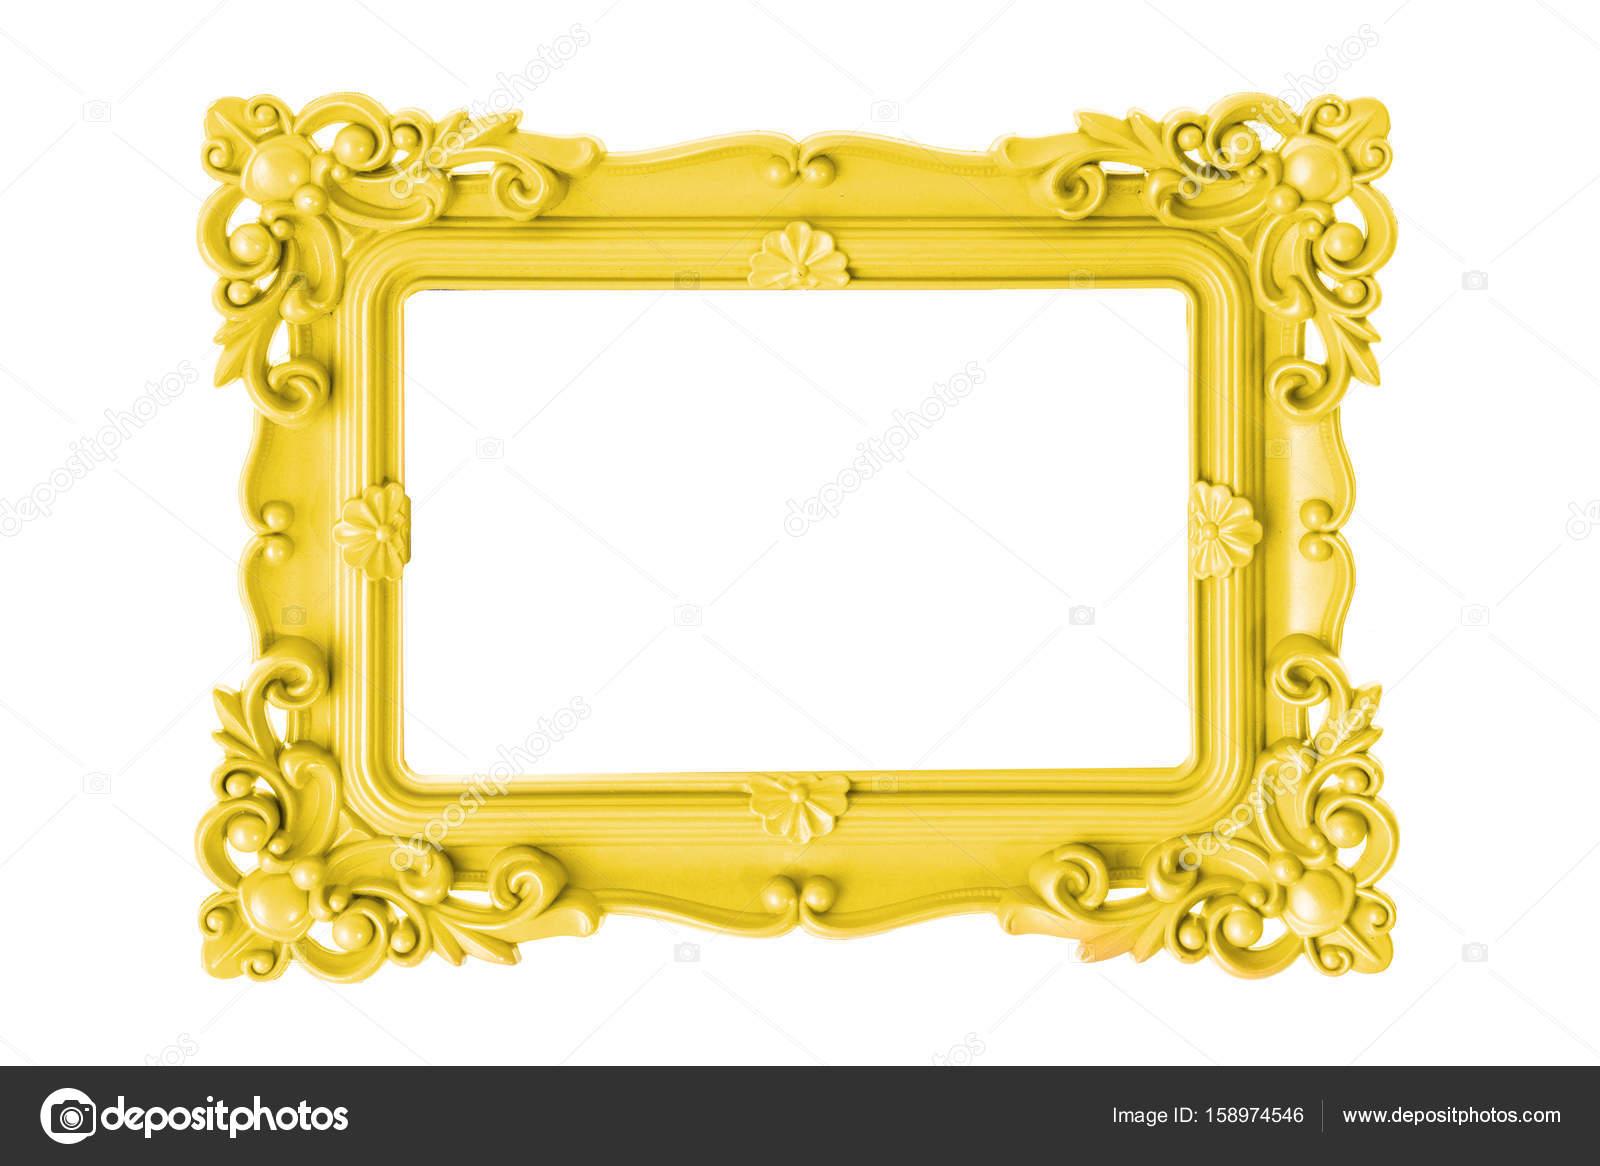 Gelbe Bilderrahmen — Stockfoto © anthonypaz #158974546